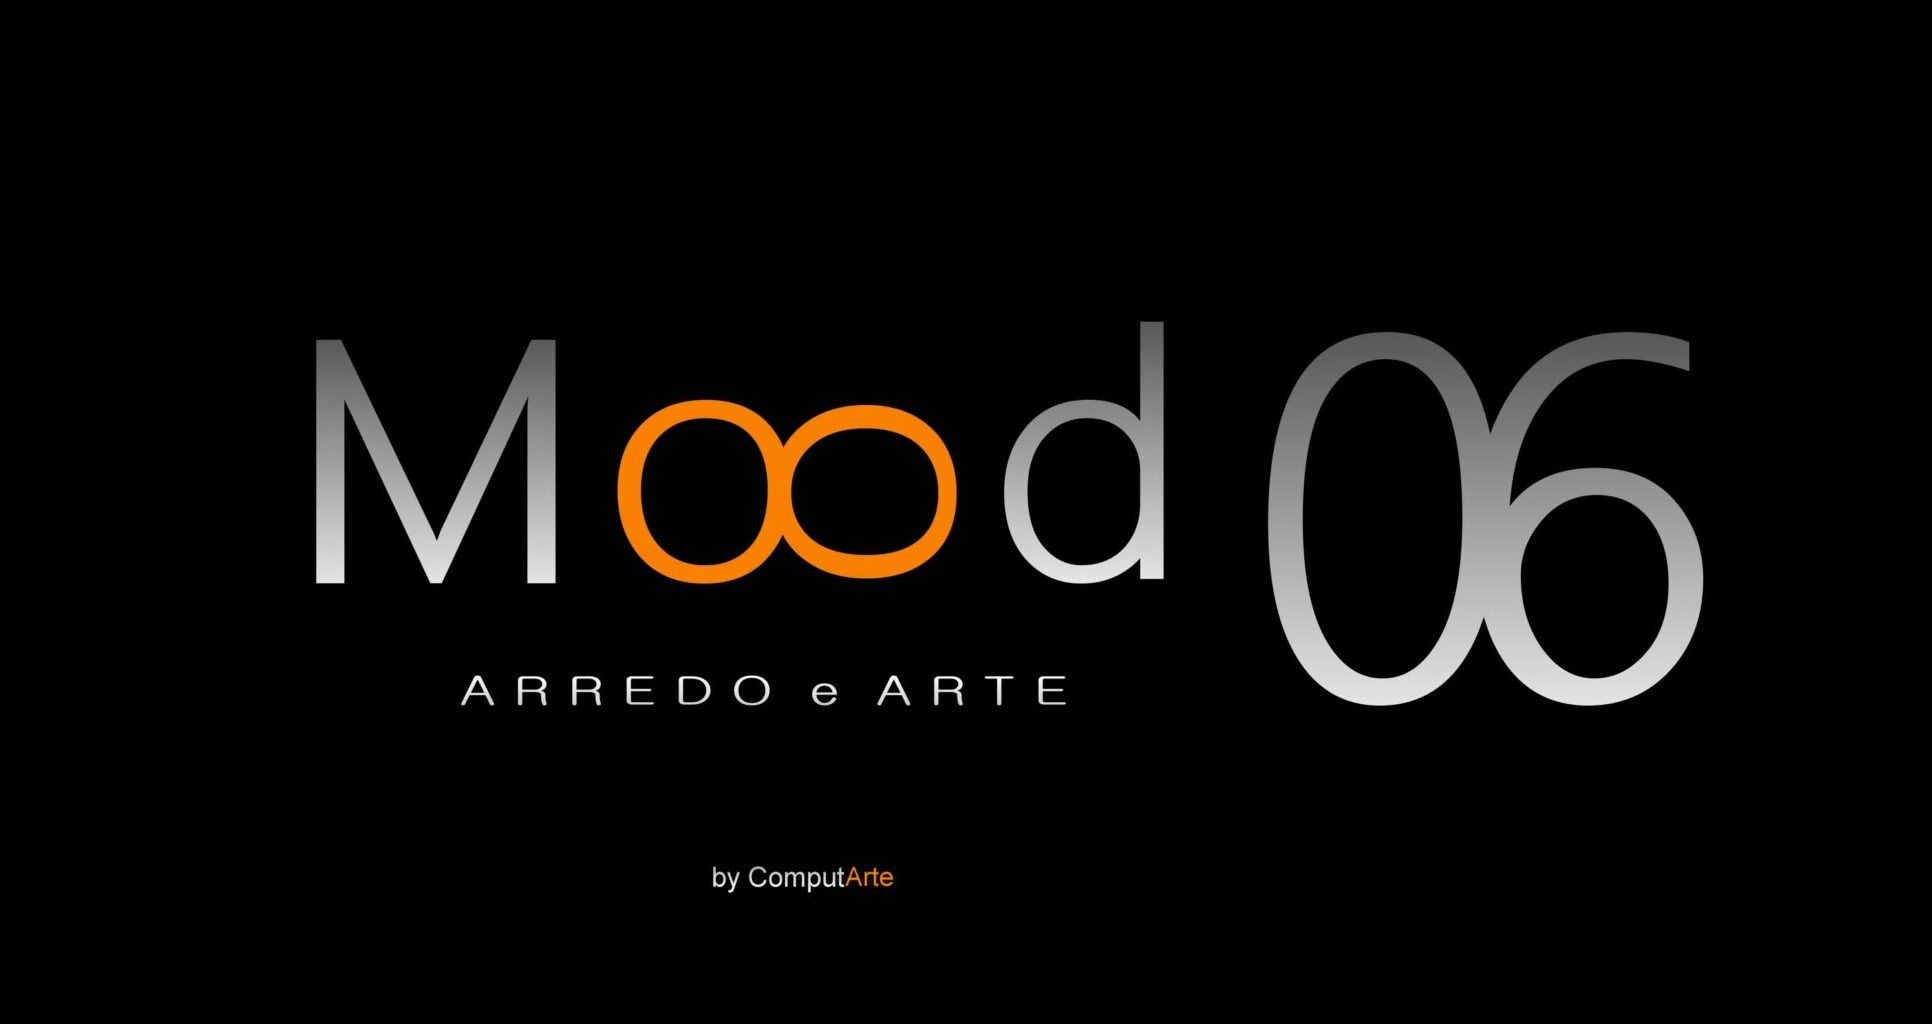 Mood06 Arredo e Arte by ComputArte